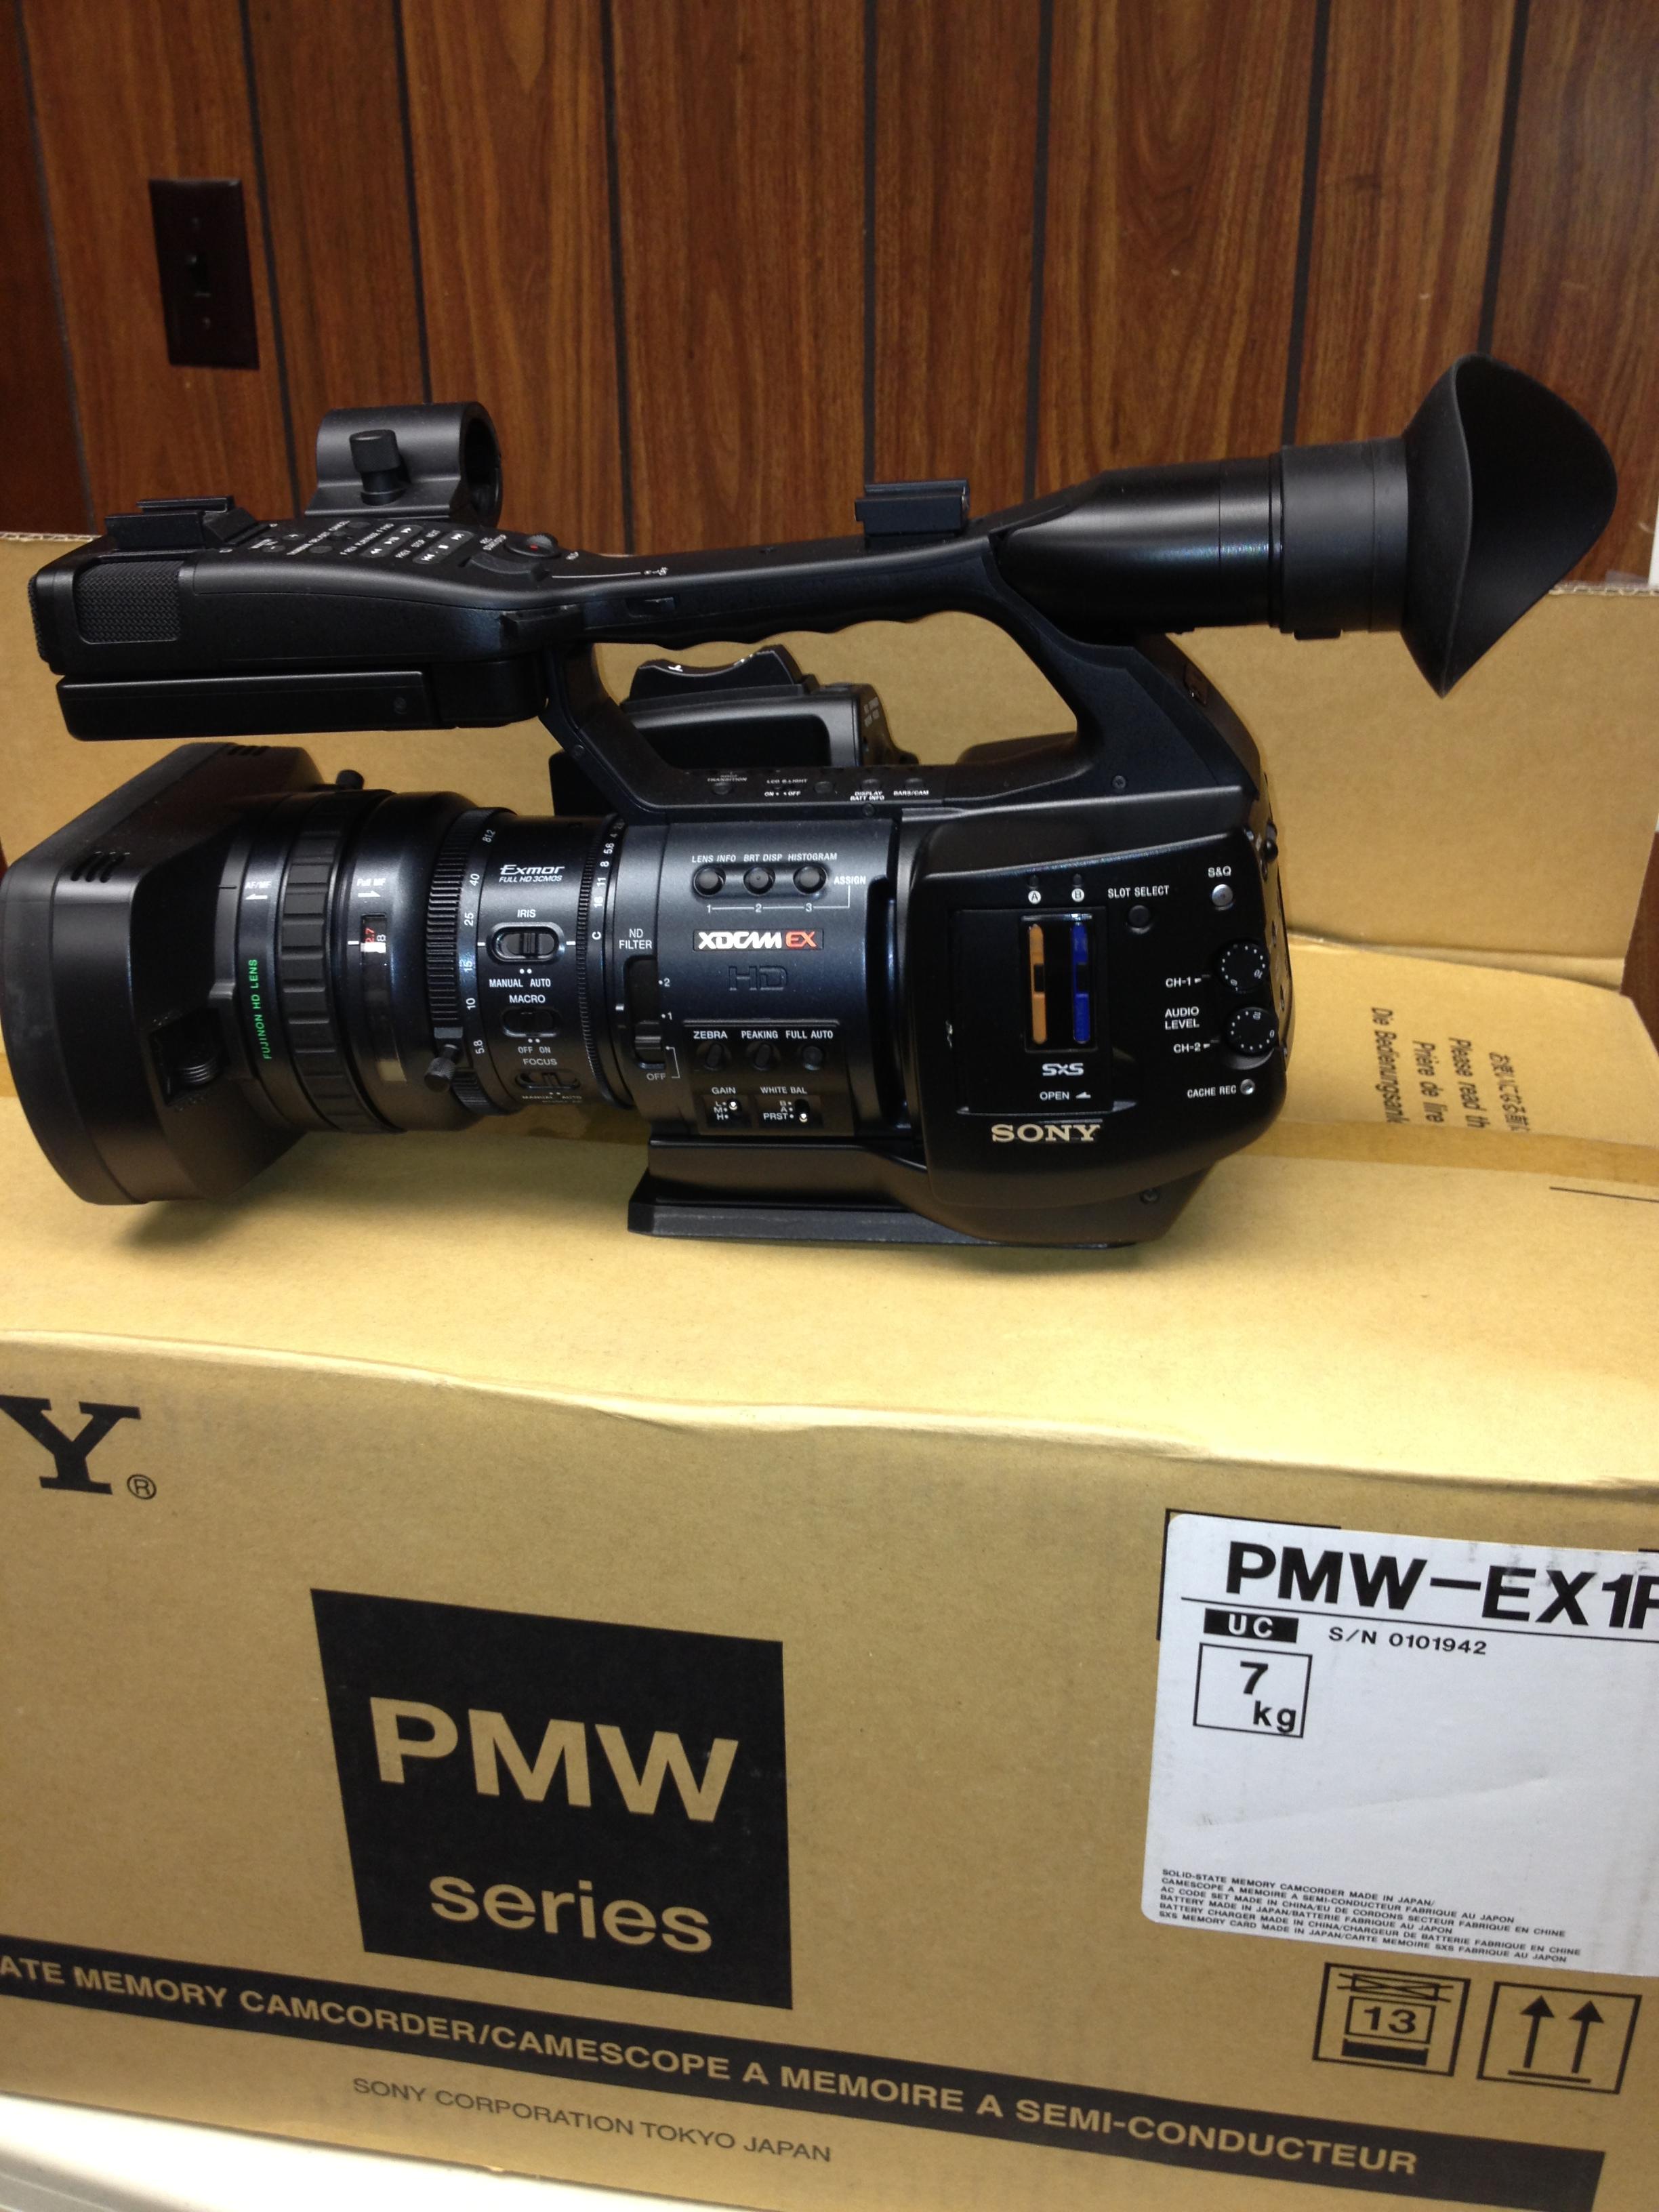 sony pmw ex1r xdcam ex hd camcorder rh newprovideo com Sony HXR-NX5U NXCAM sony xdcam ex manual pdf